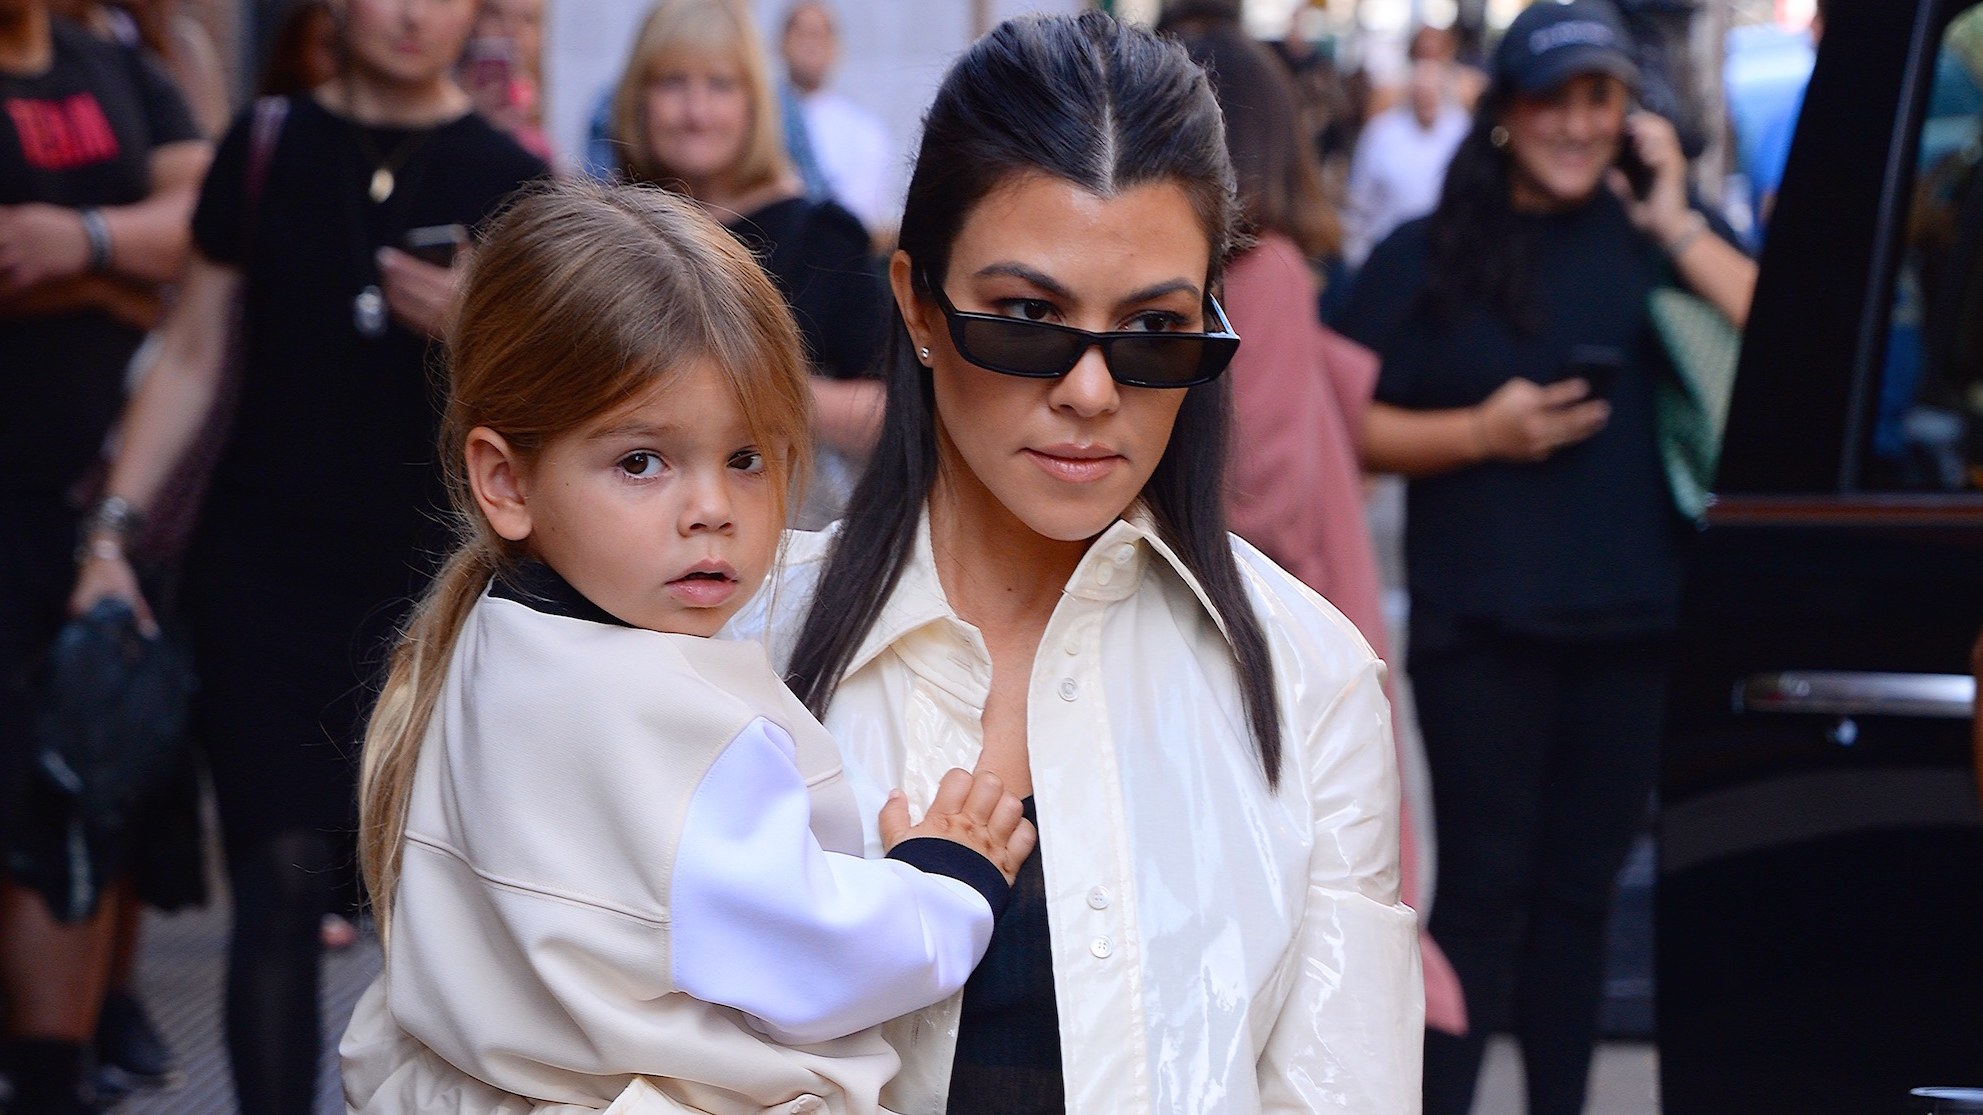 """kuwk-kourtney-kardashians-4-year-old-son-flips-paparazzi-off-in-viral-video"""